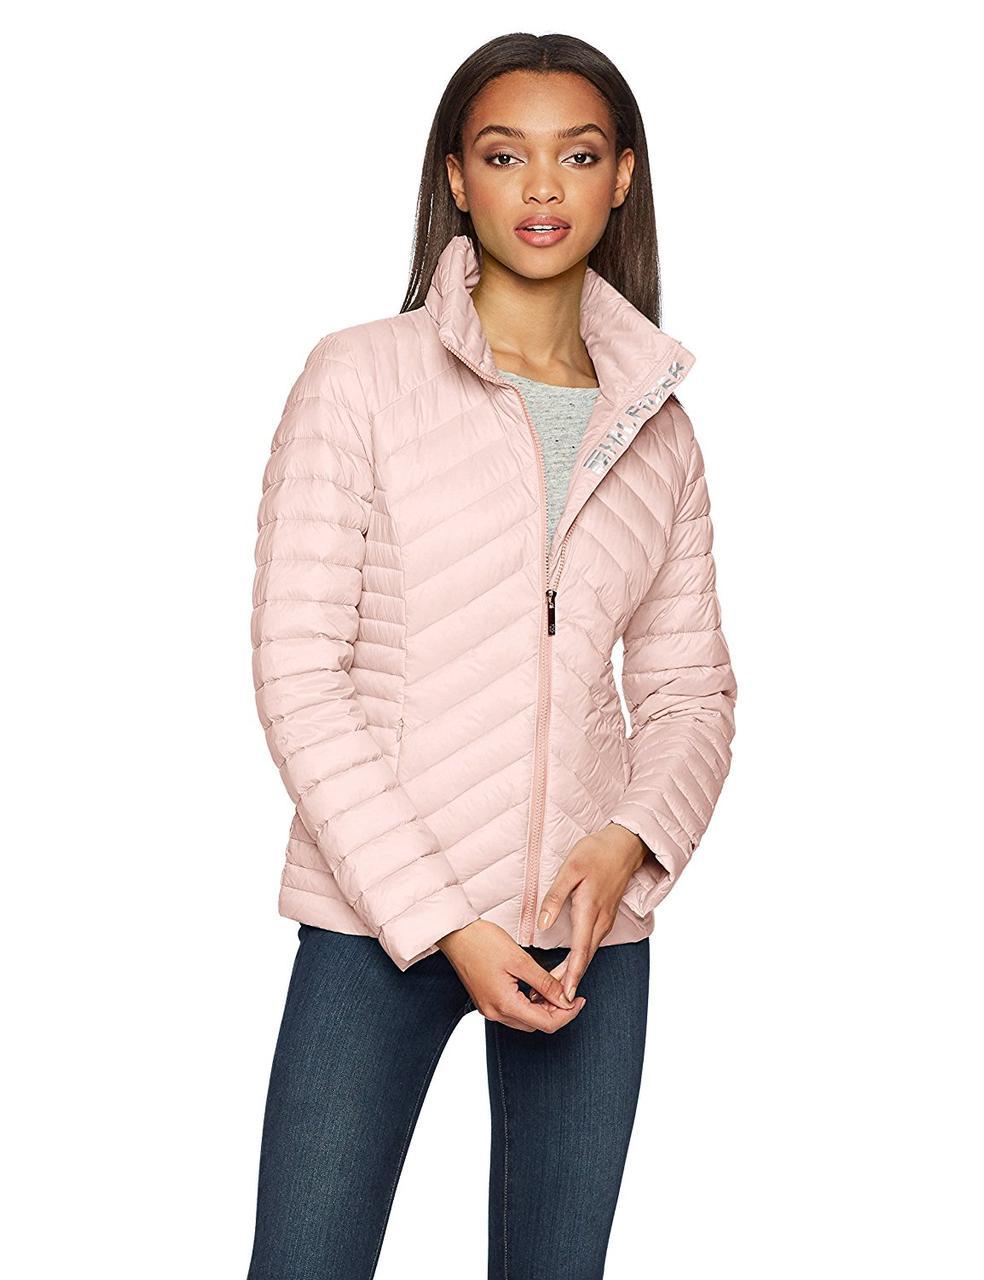 e4d615dc3b9d Демисезонная женская куртка пуховик Tommy Hilfiger в размере S, оригинал!:  продажа, цена в ...